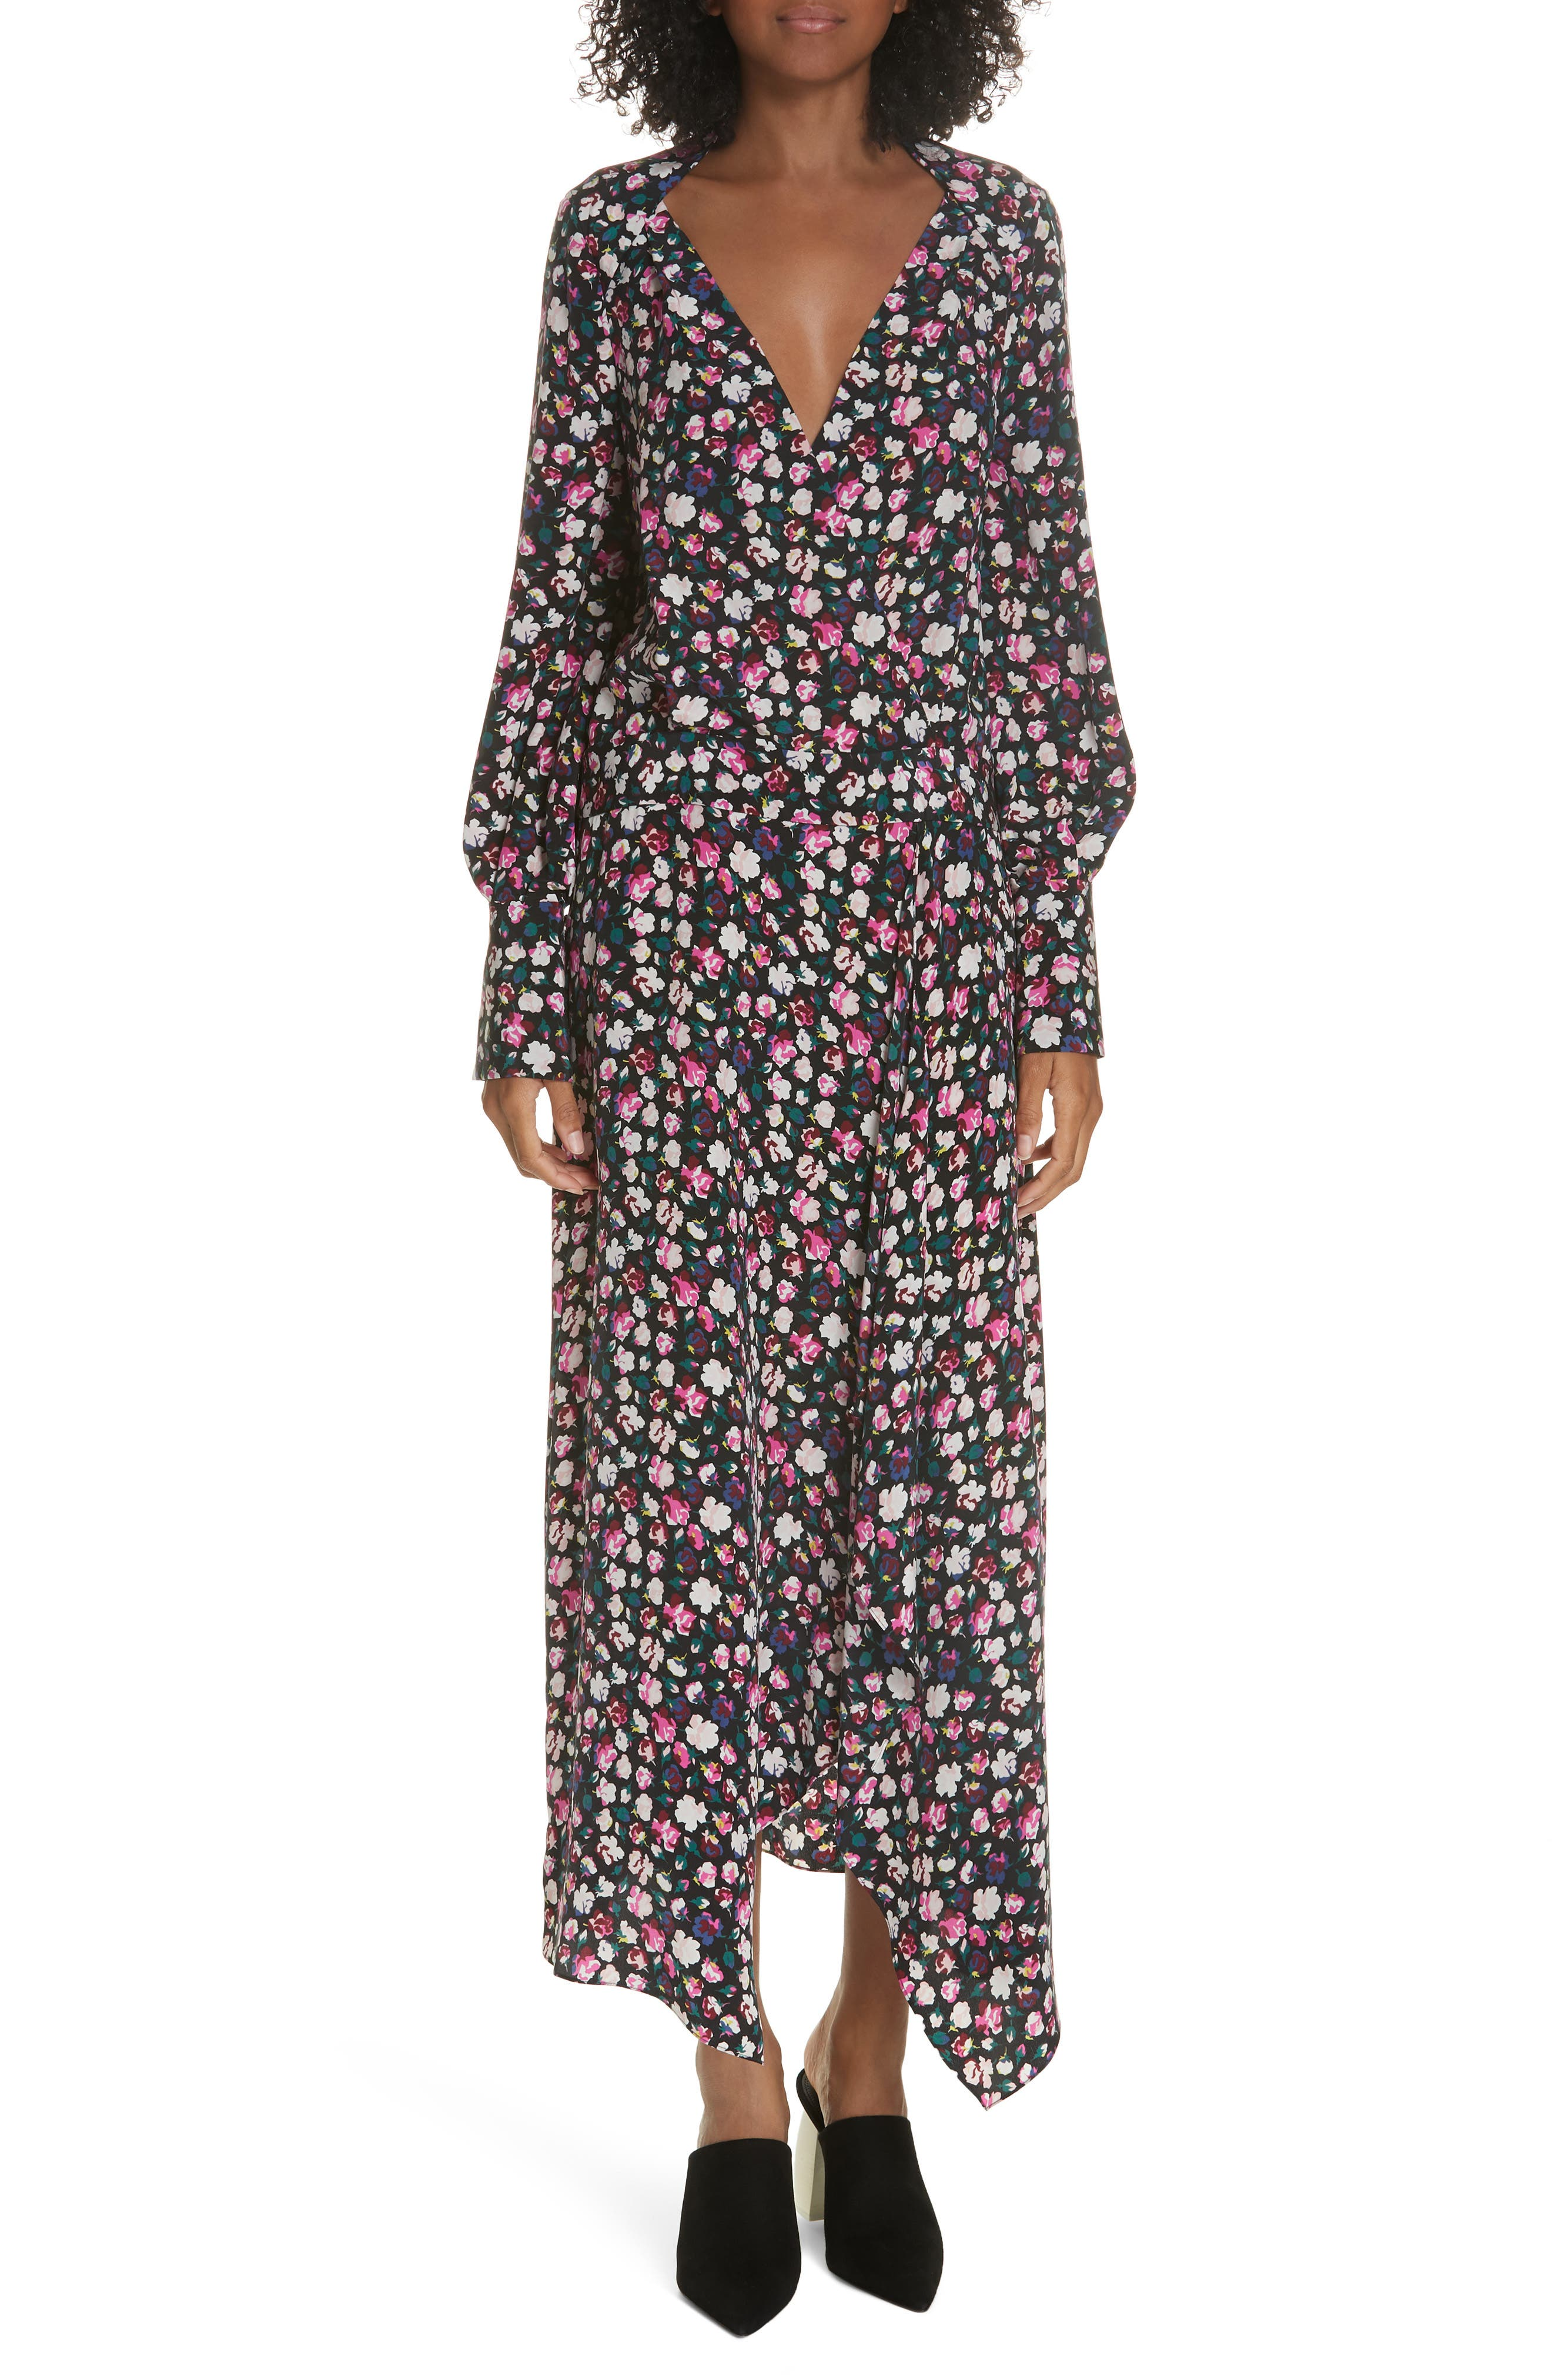 Equipment Neema Floral Faux Wrap Dress